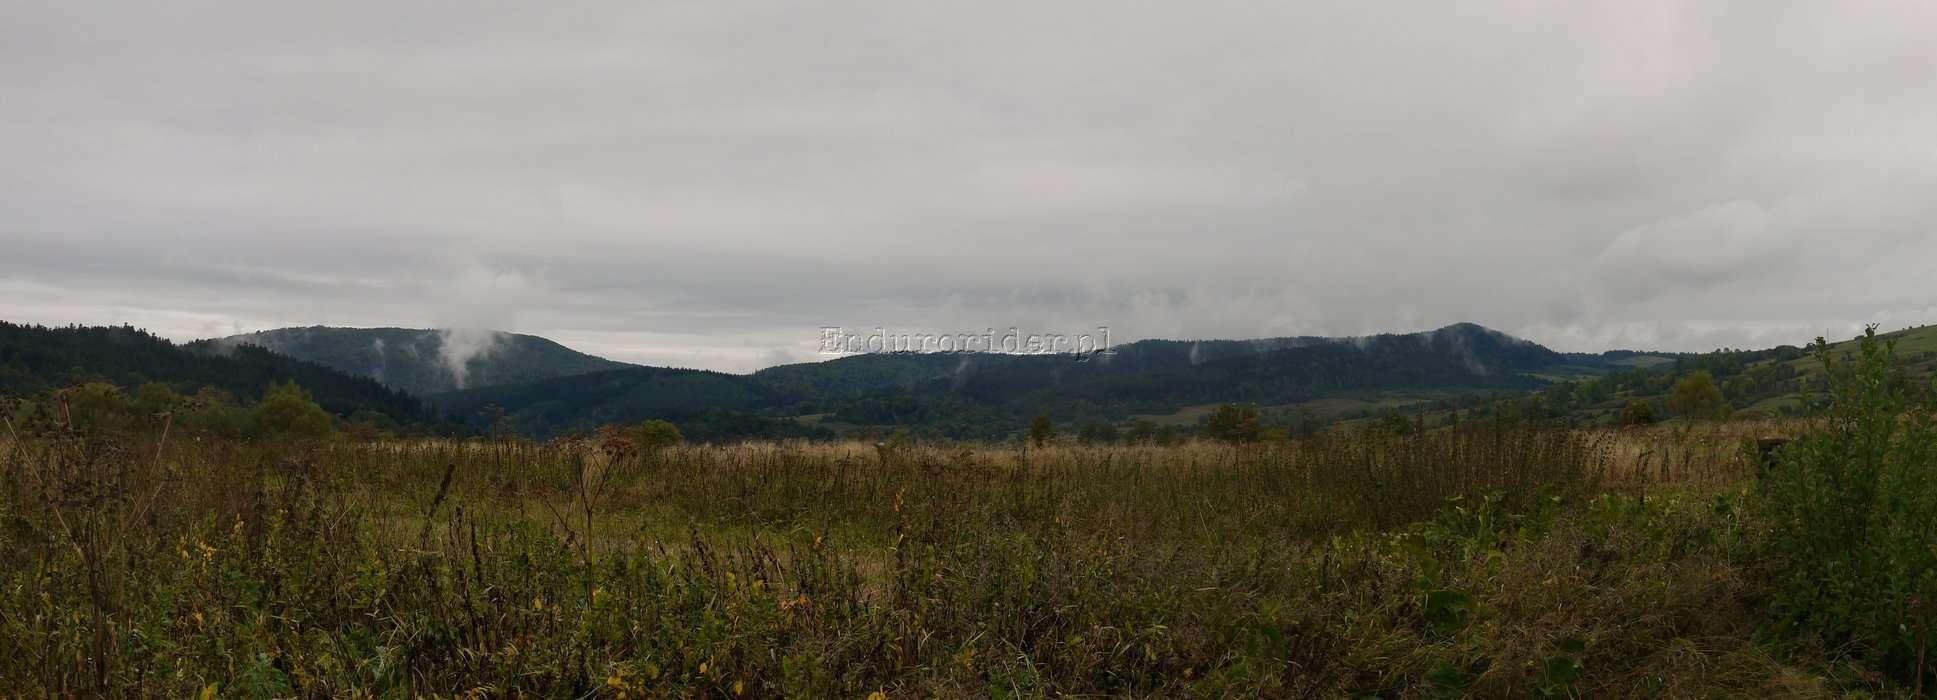 P1050750 Panorama